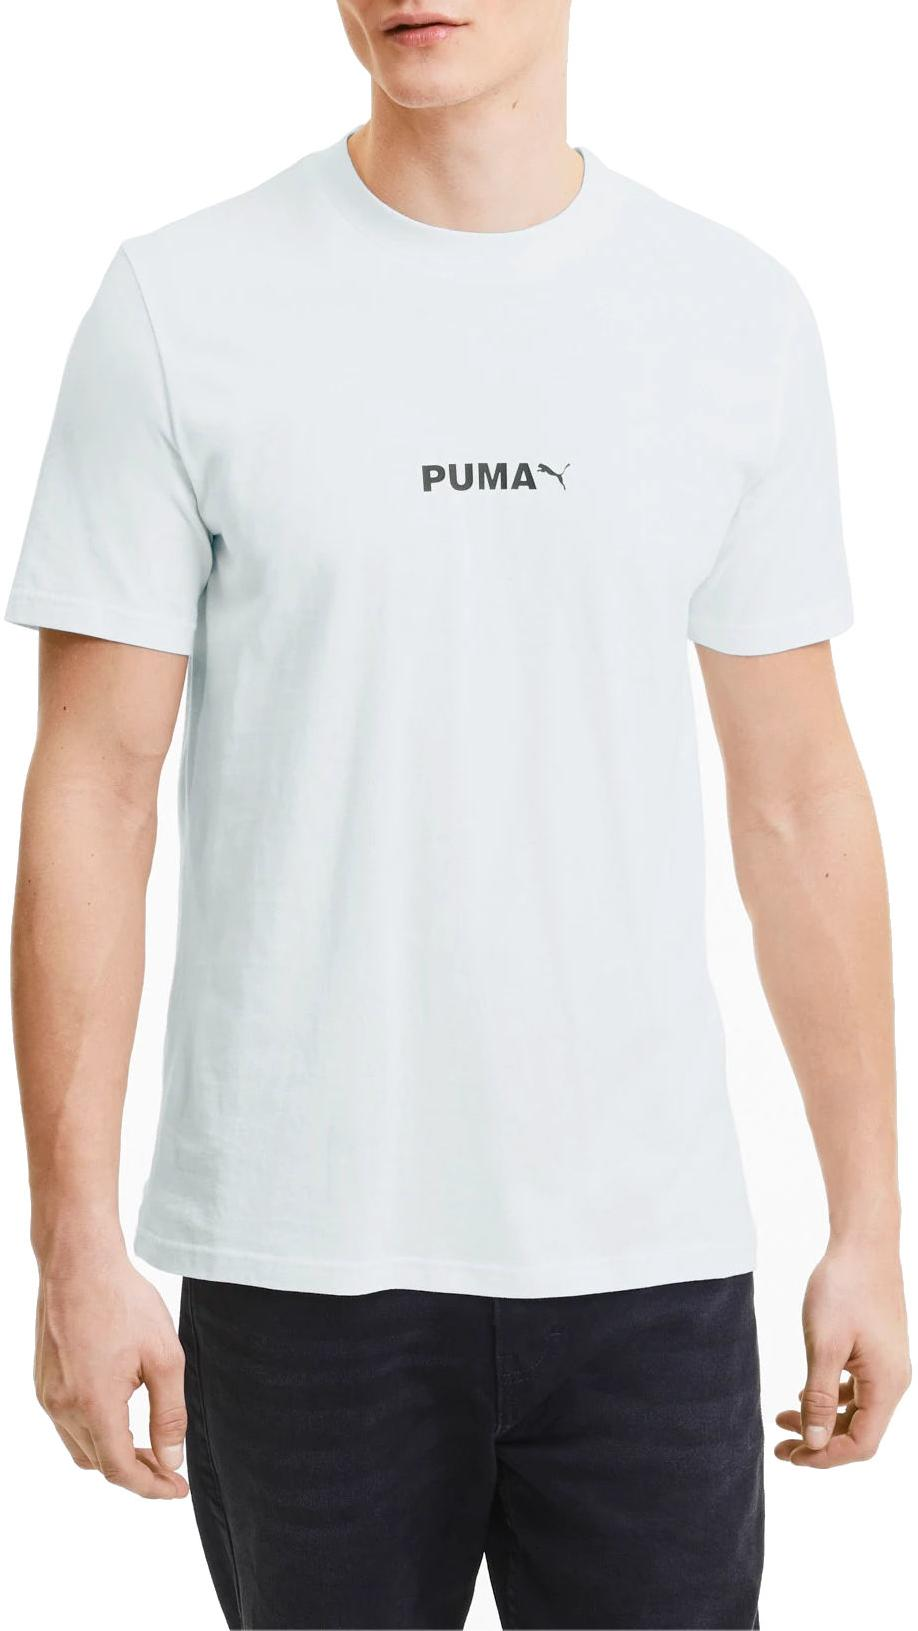 Tričko Puma Avenir Graphic Tee